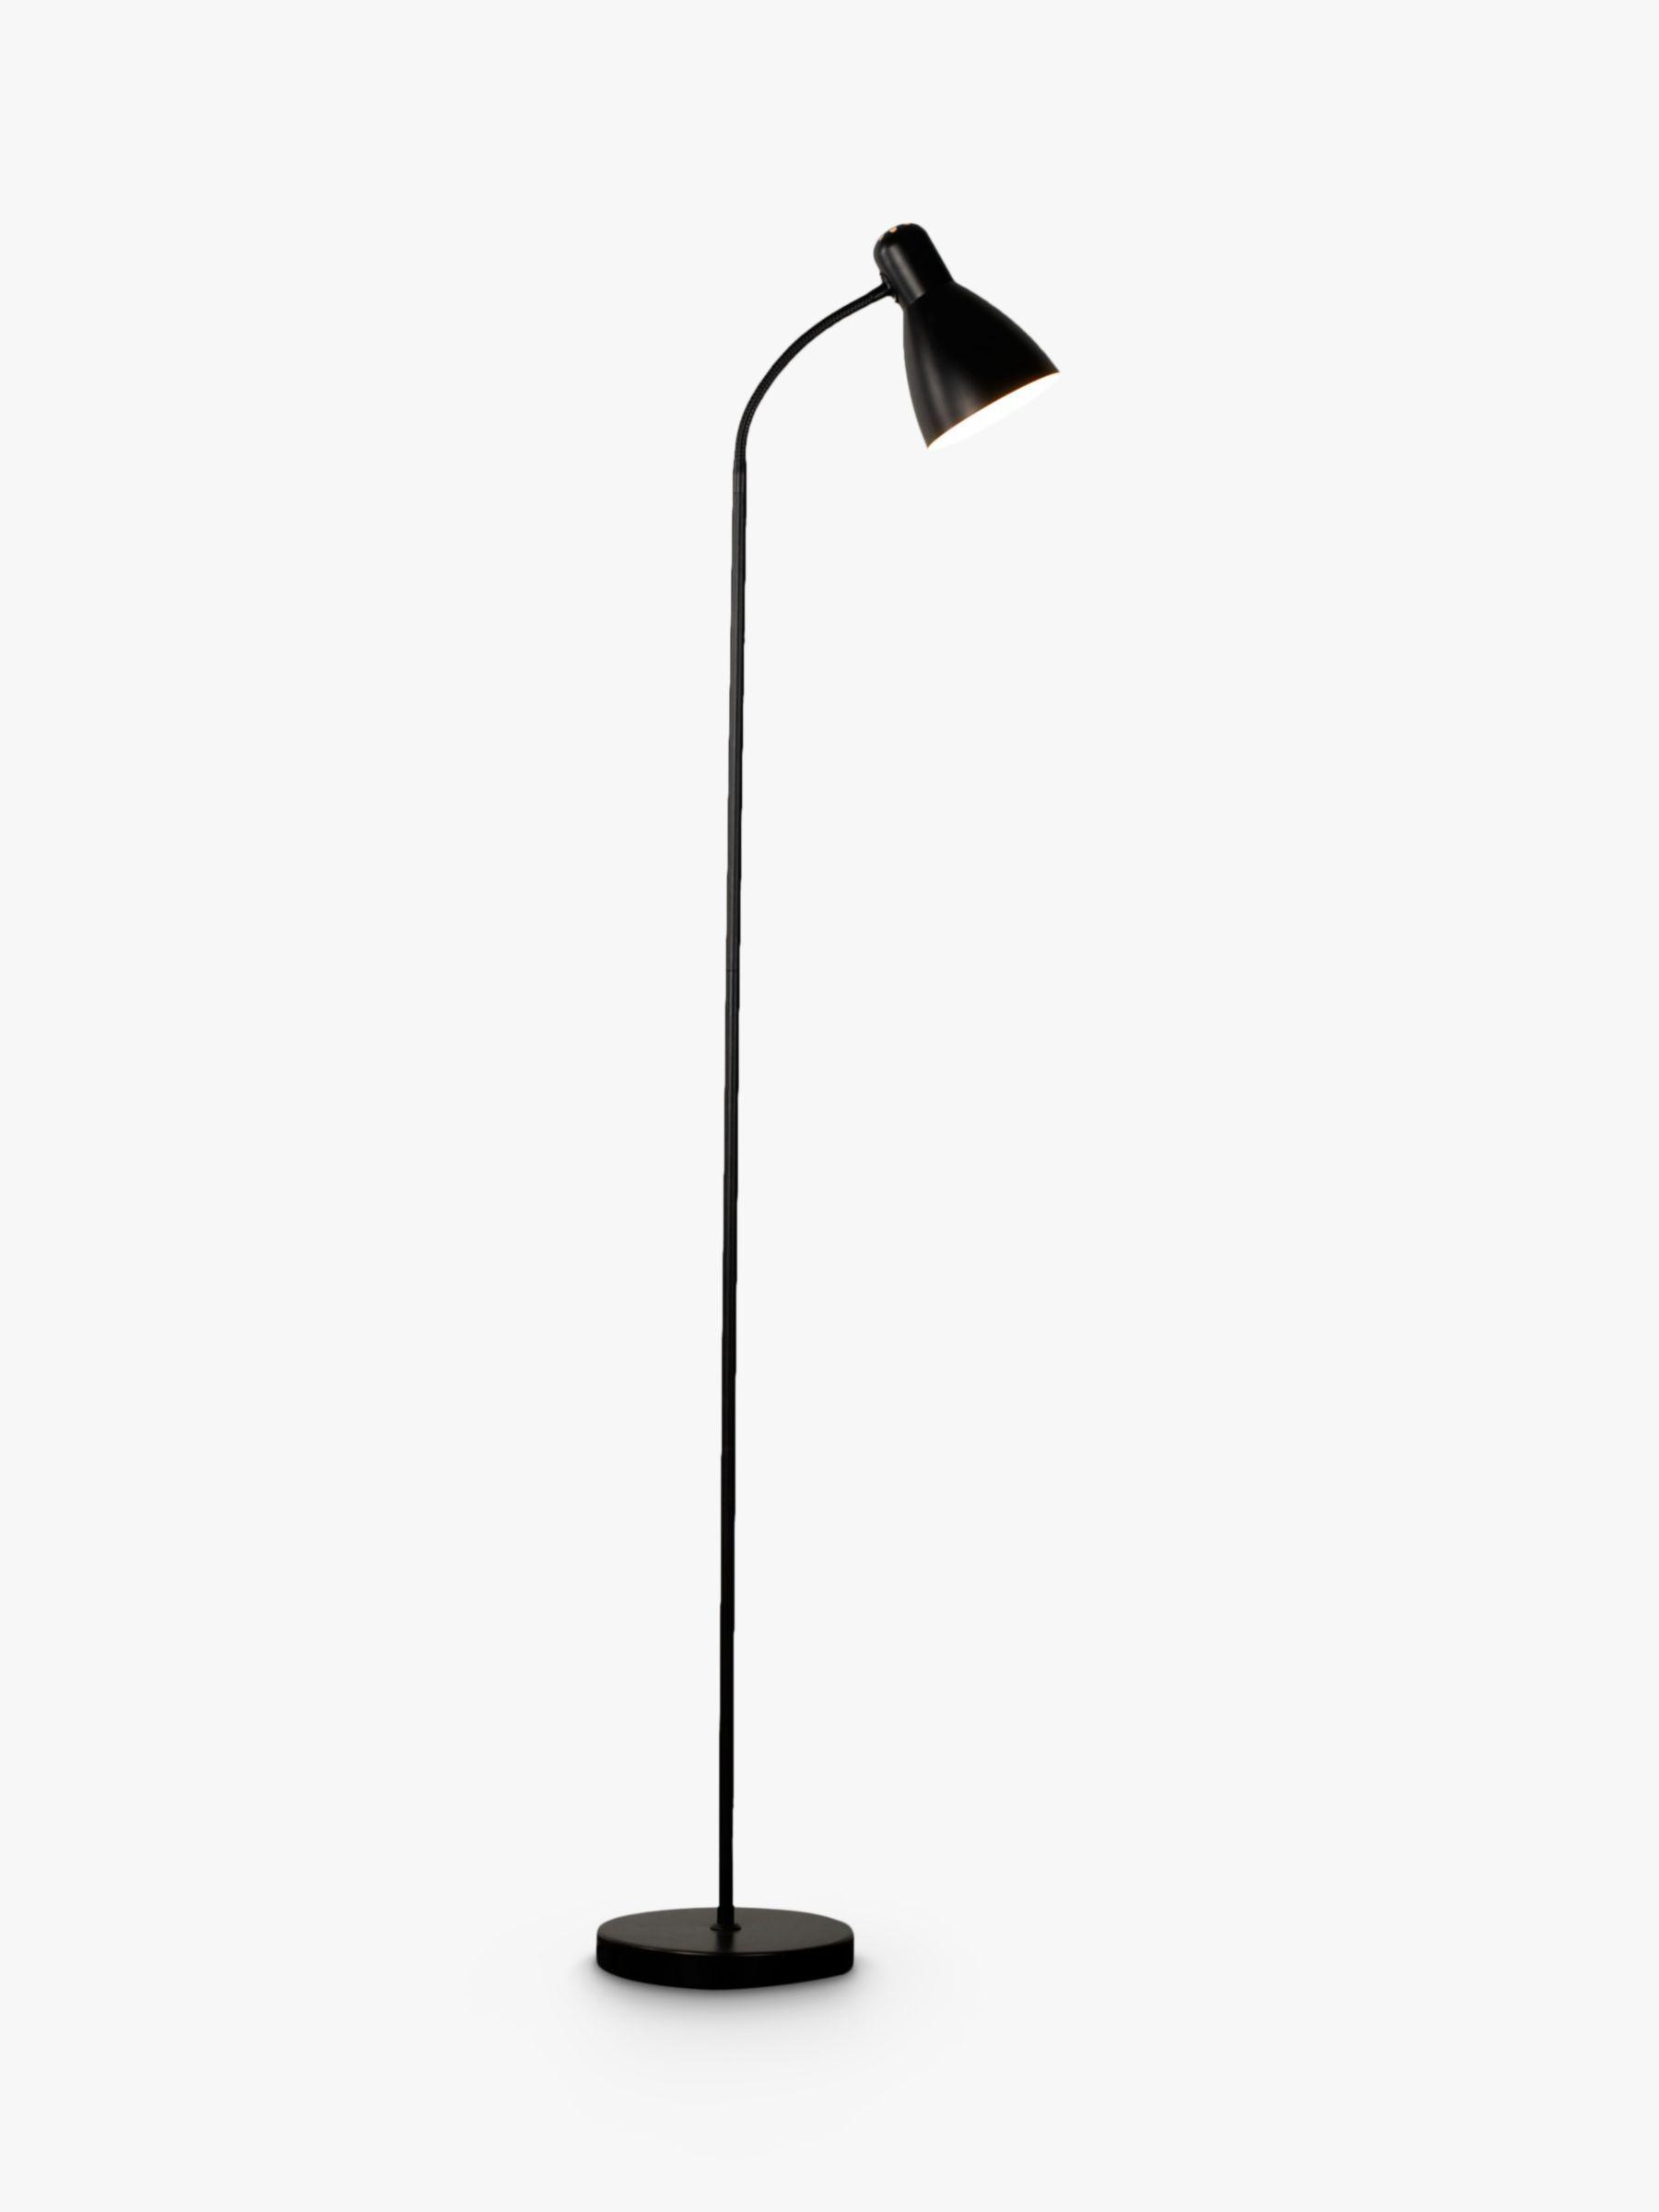 ANYDAY John Lewis & Partners Brandon Floor Lamp, Black | £30